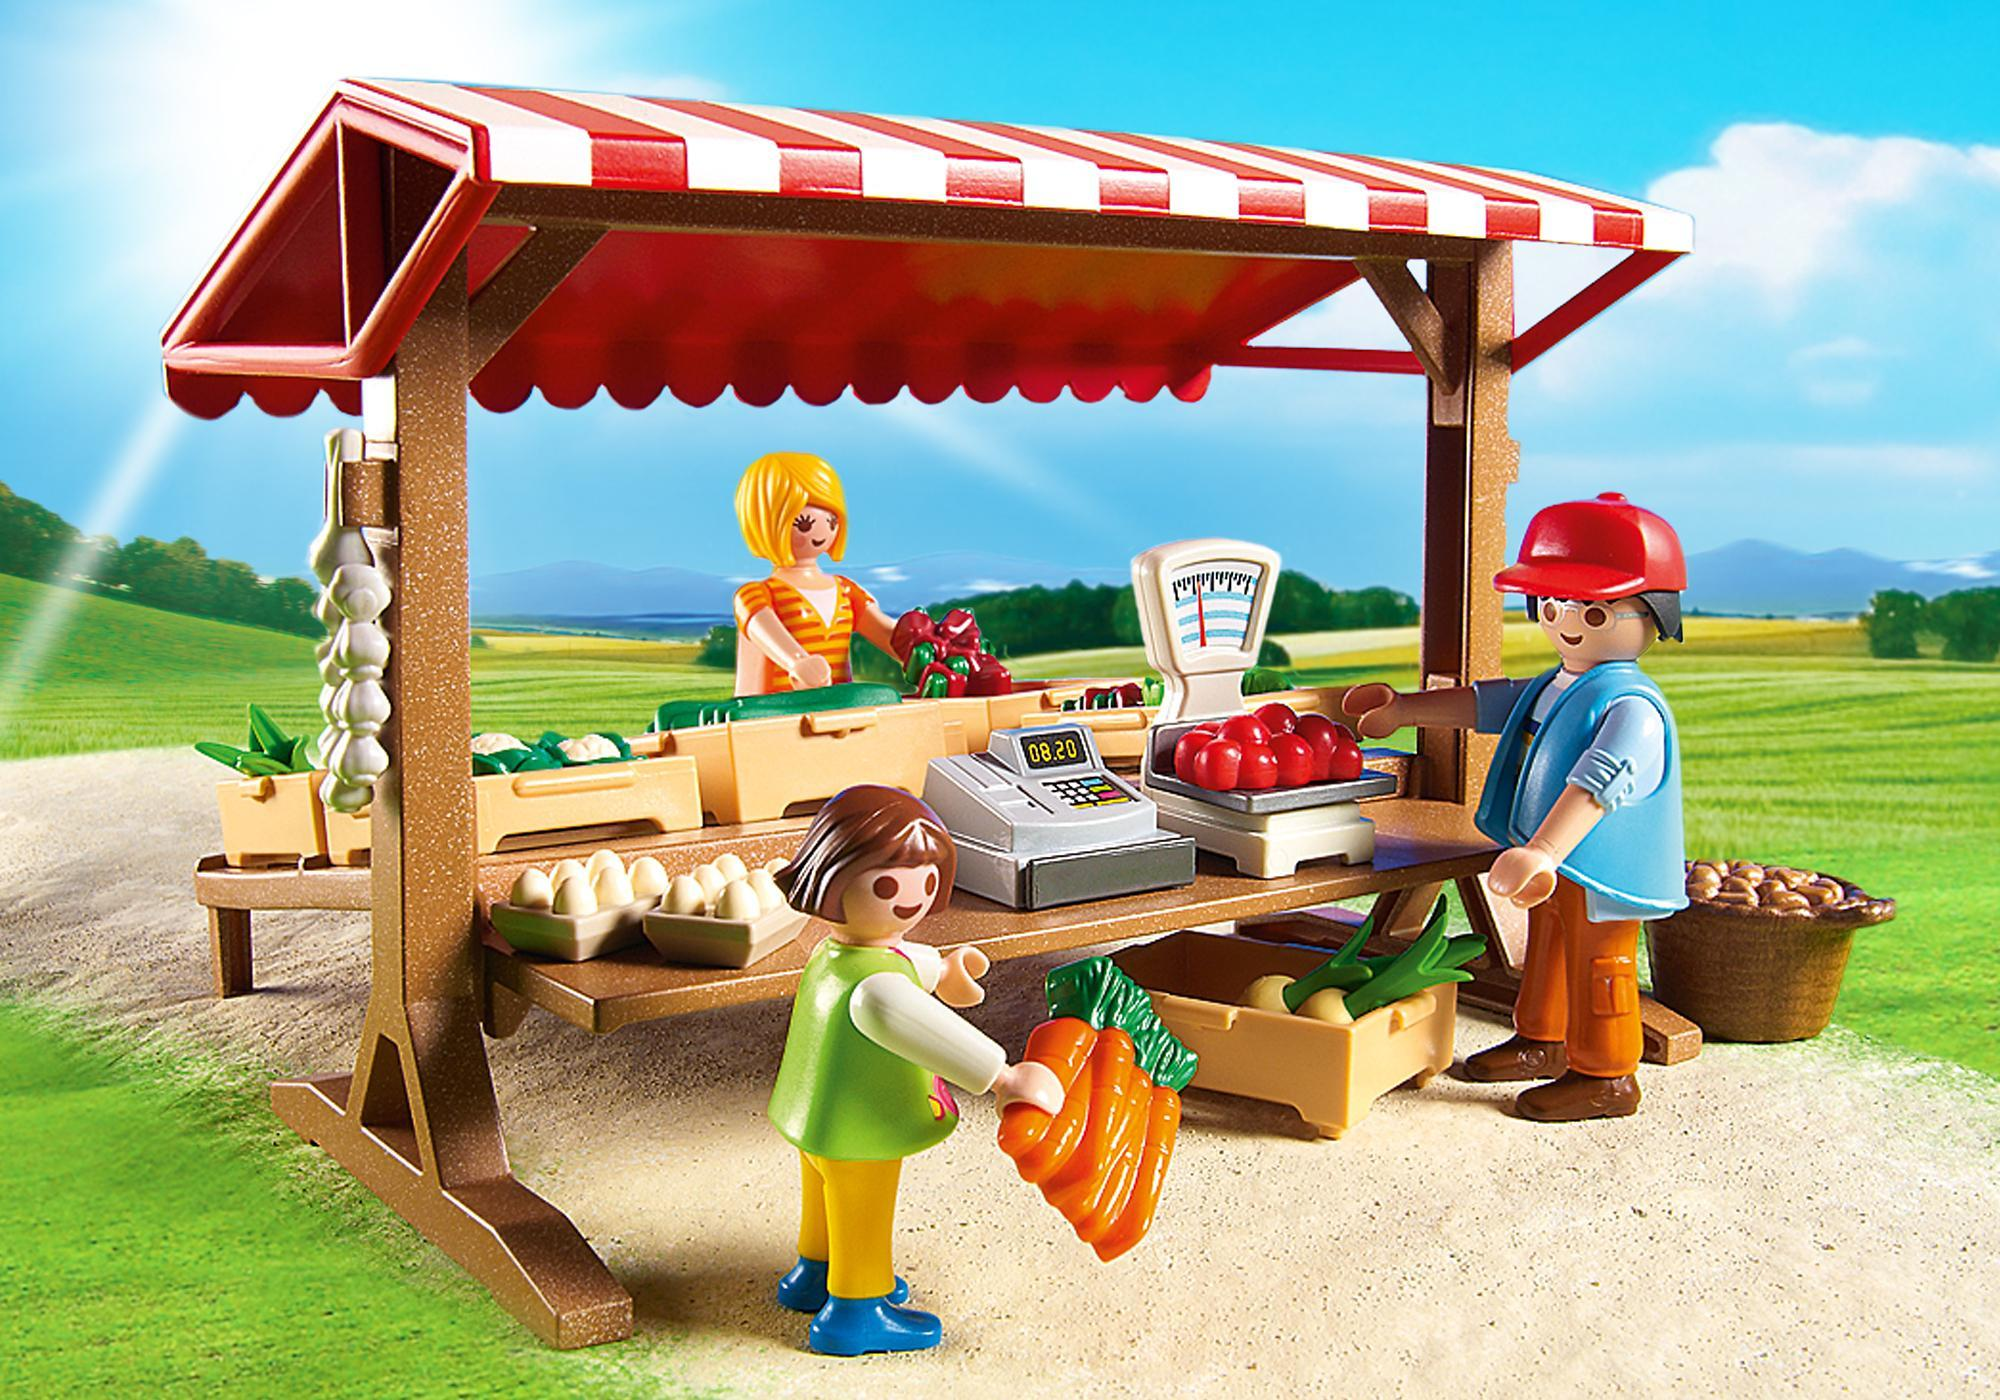 http://media.playmobil.com/i/playmobil/6121_product_extra1